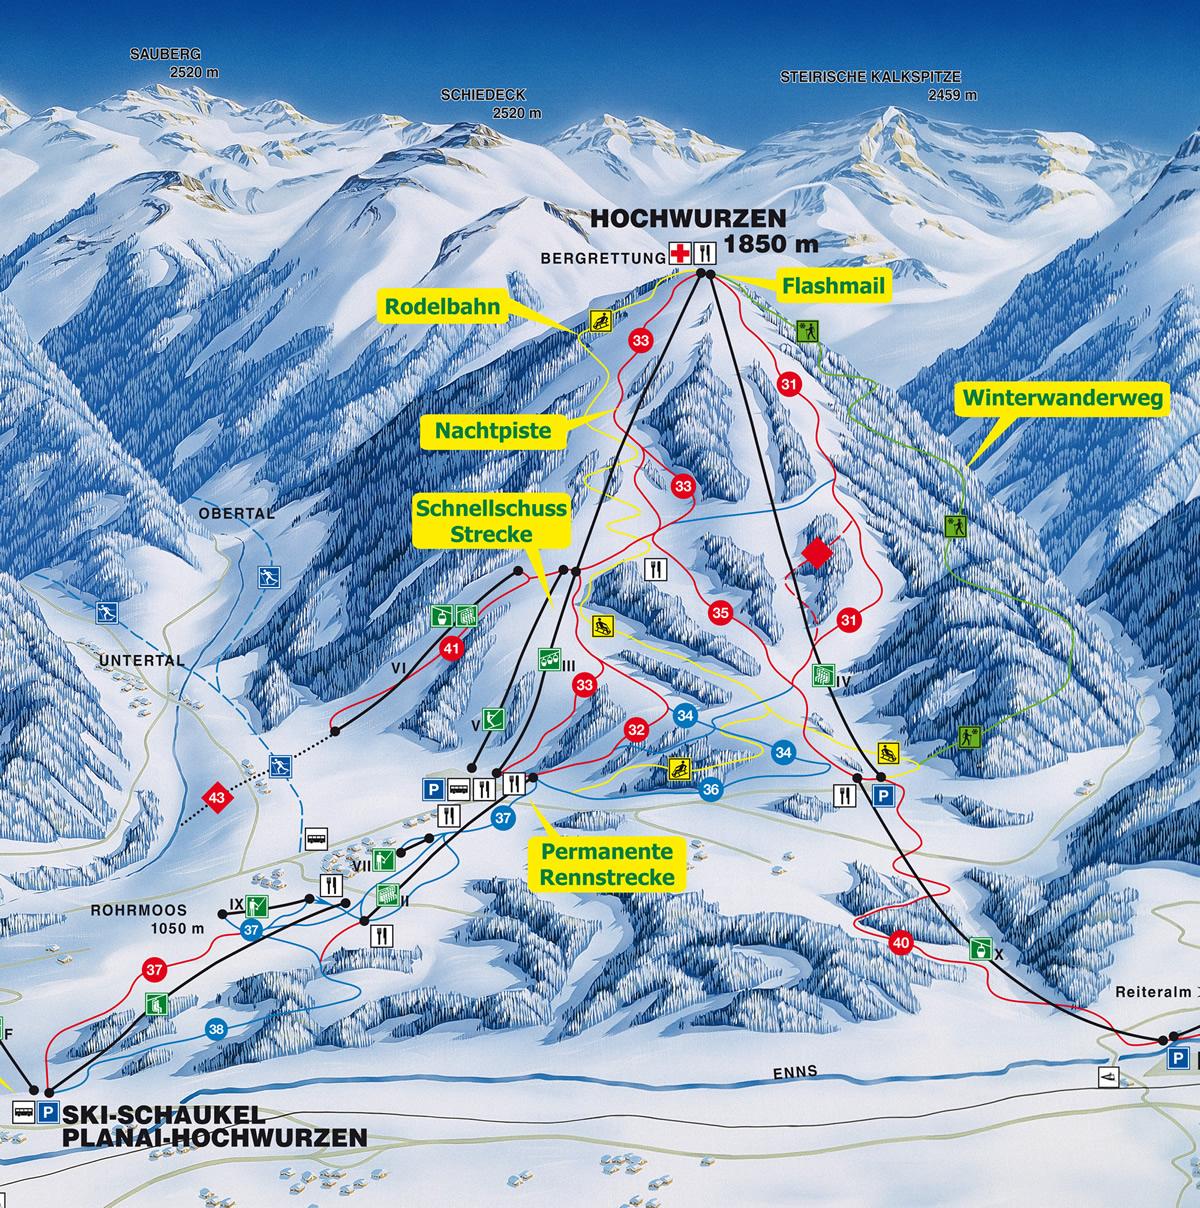 Hochwurzen - Ski amade